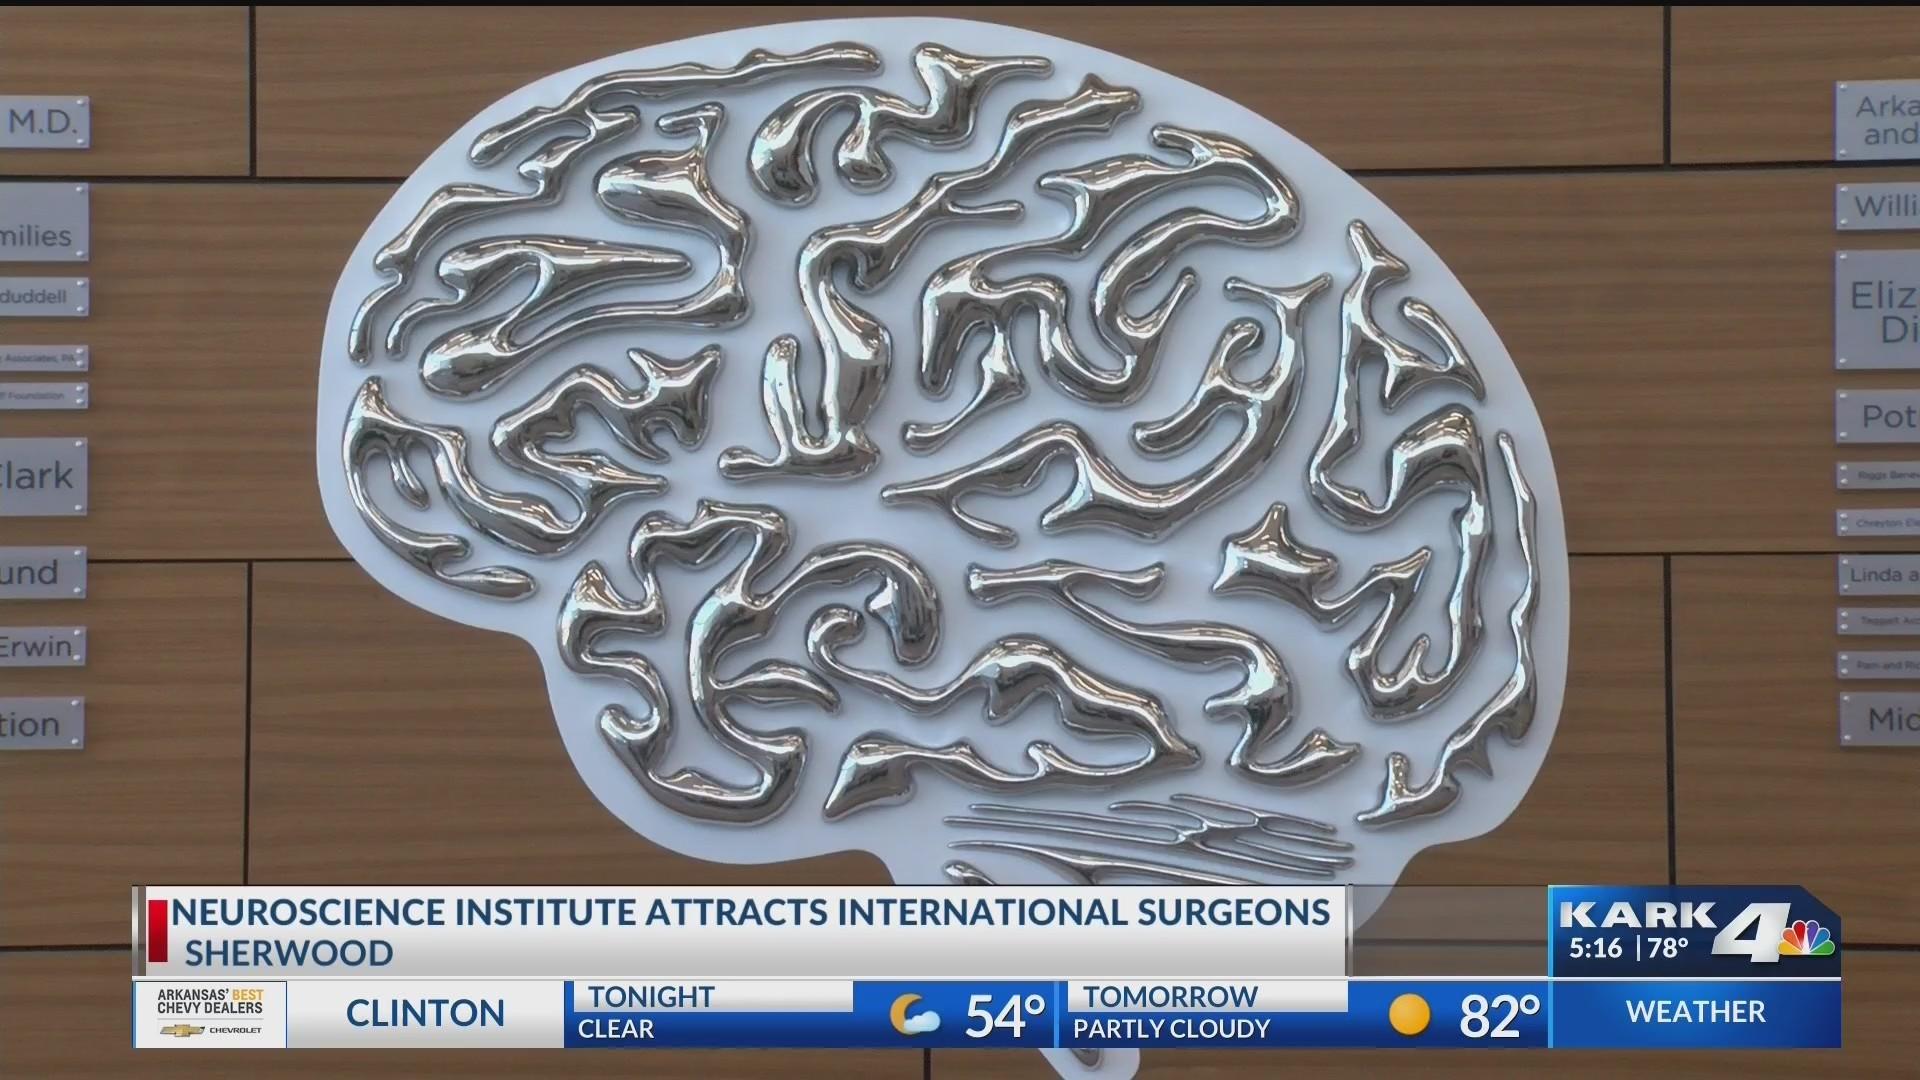 Neuroscience_Institute_Attracts_Internat_0_20190613224821-118809306